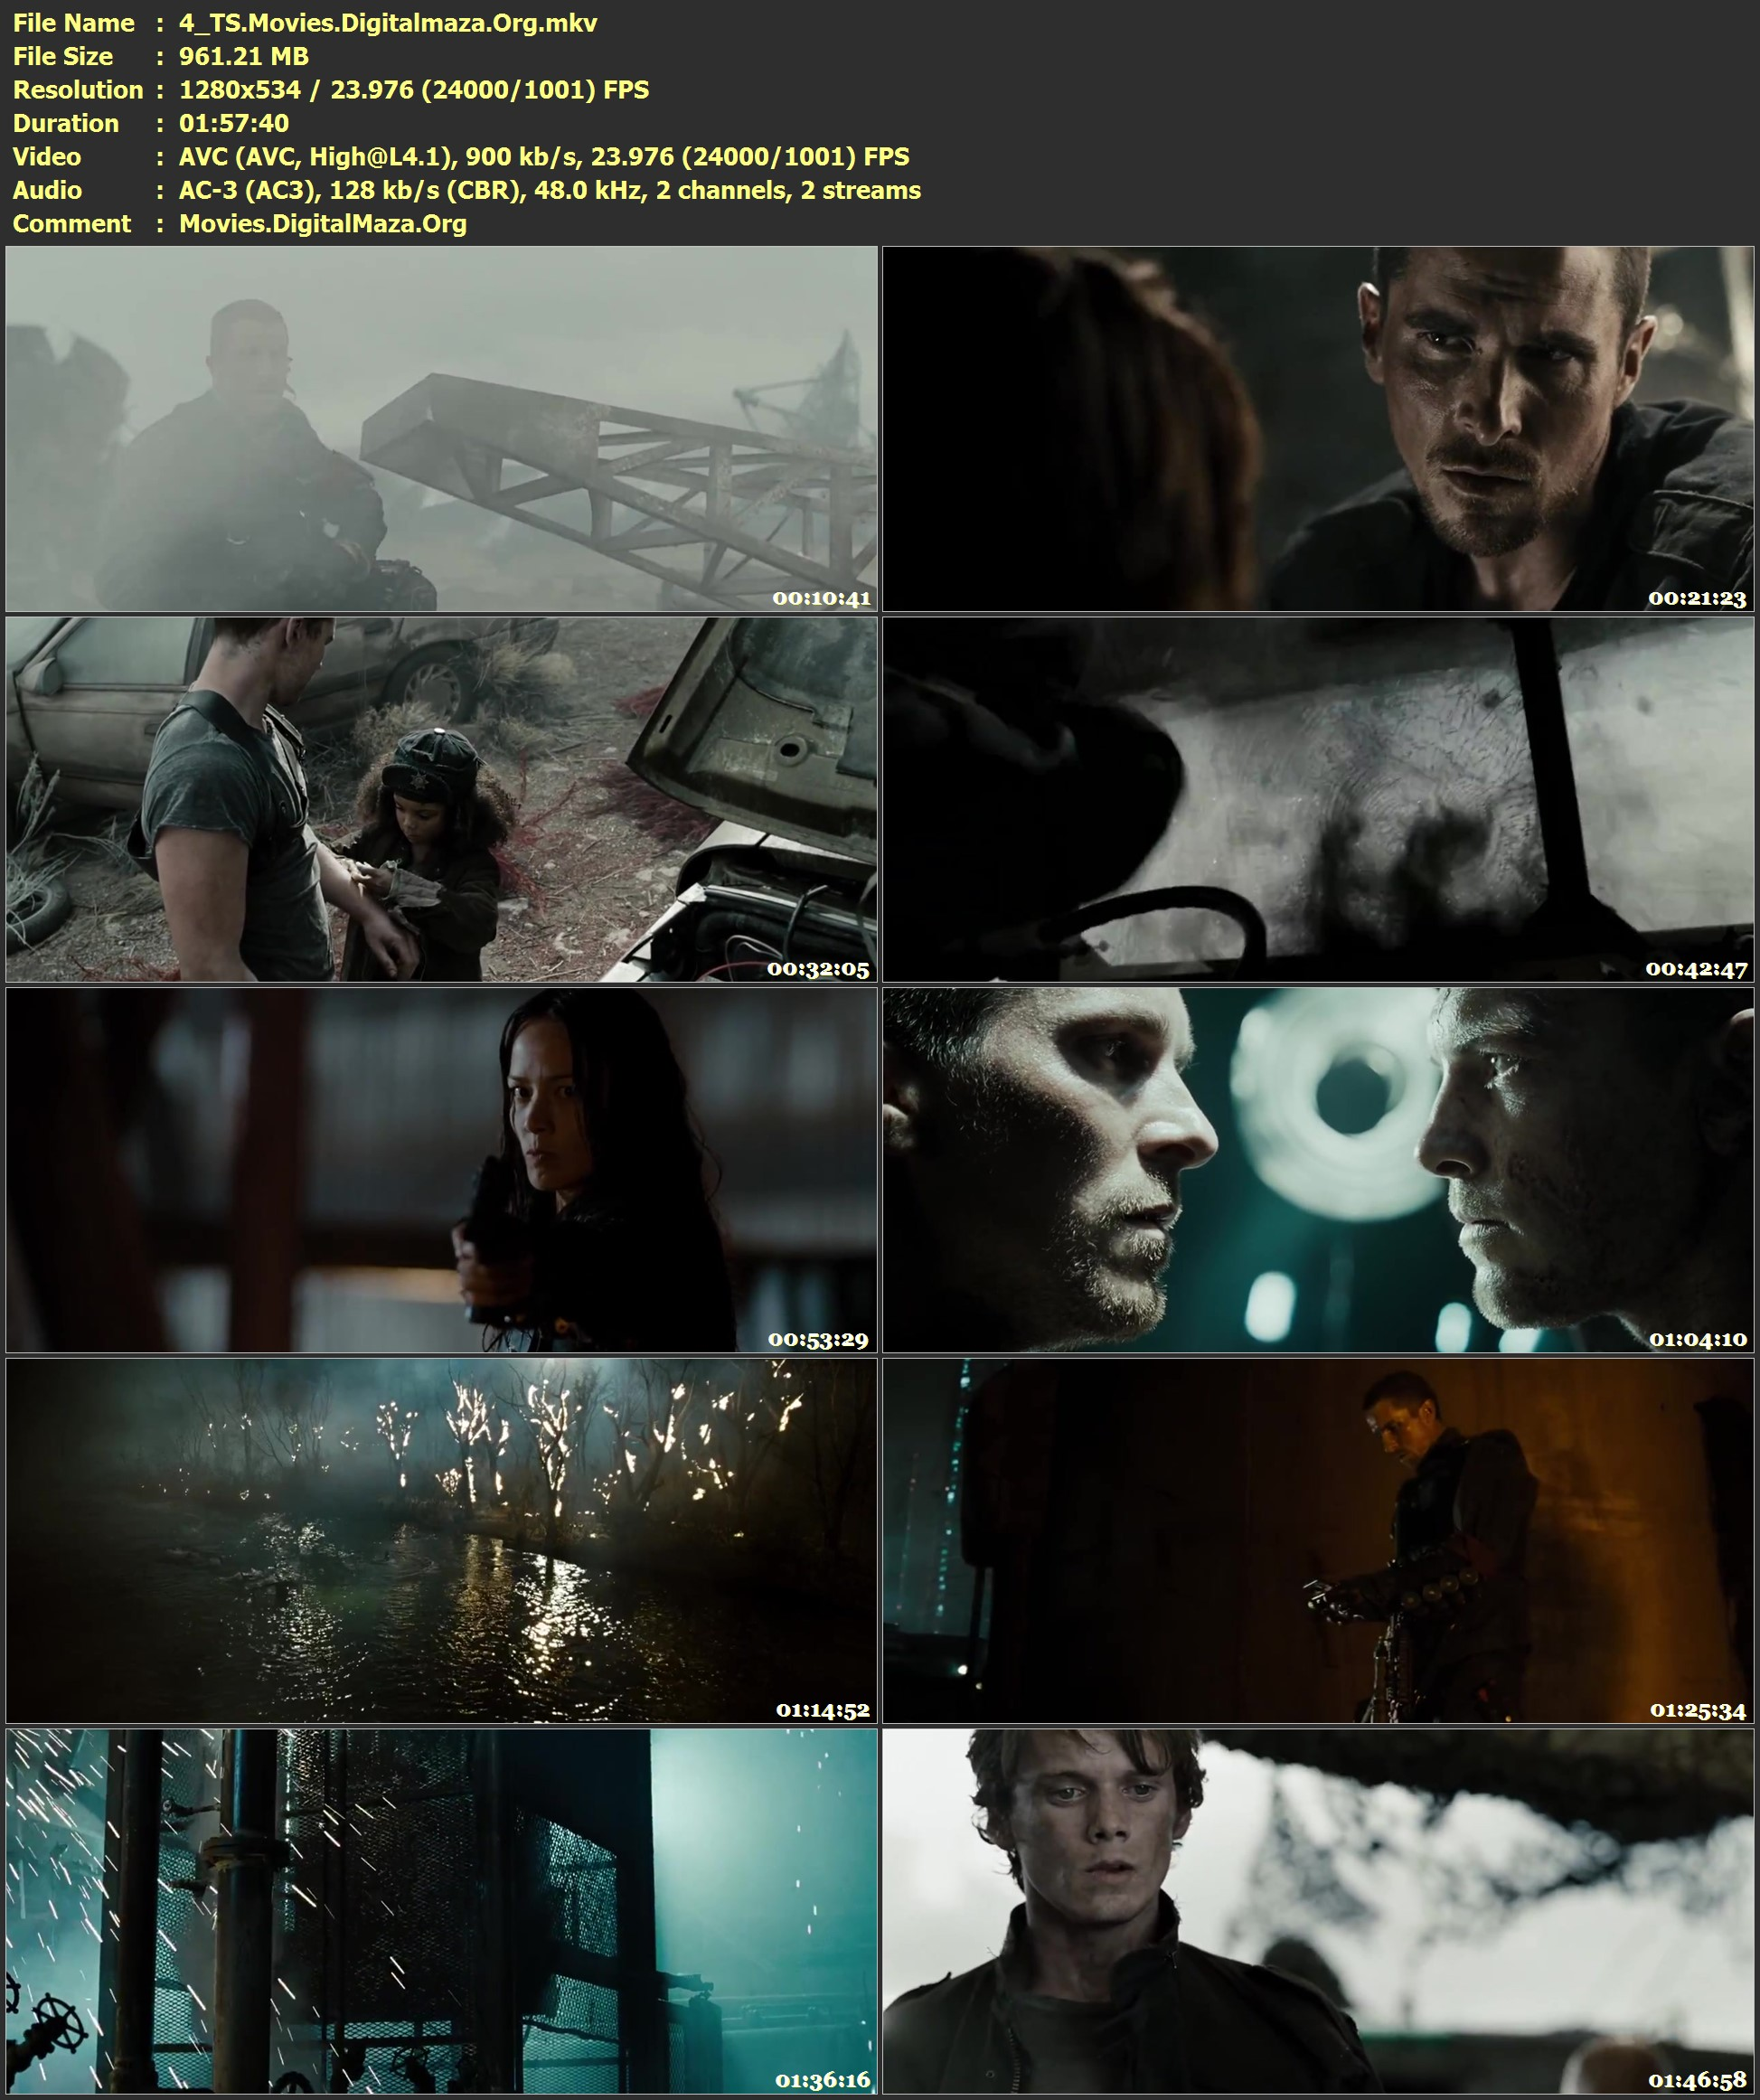 https://image.ibb.co/f5htDH/4_TS_Movies_Digitalmaza_Org_mkv.jpg